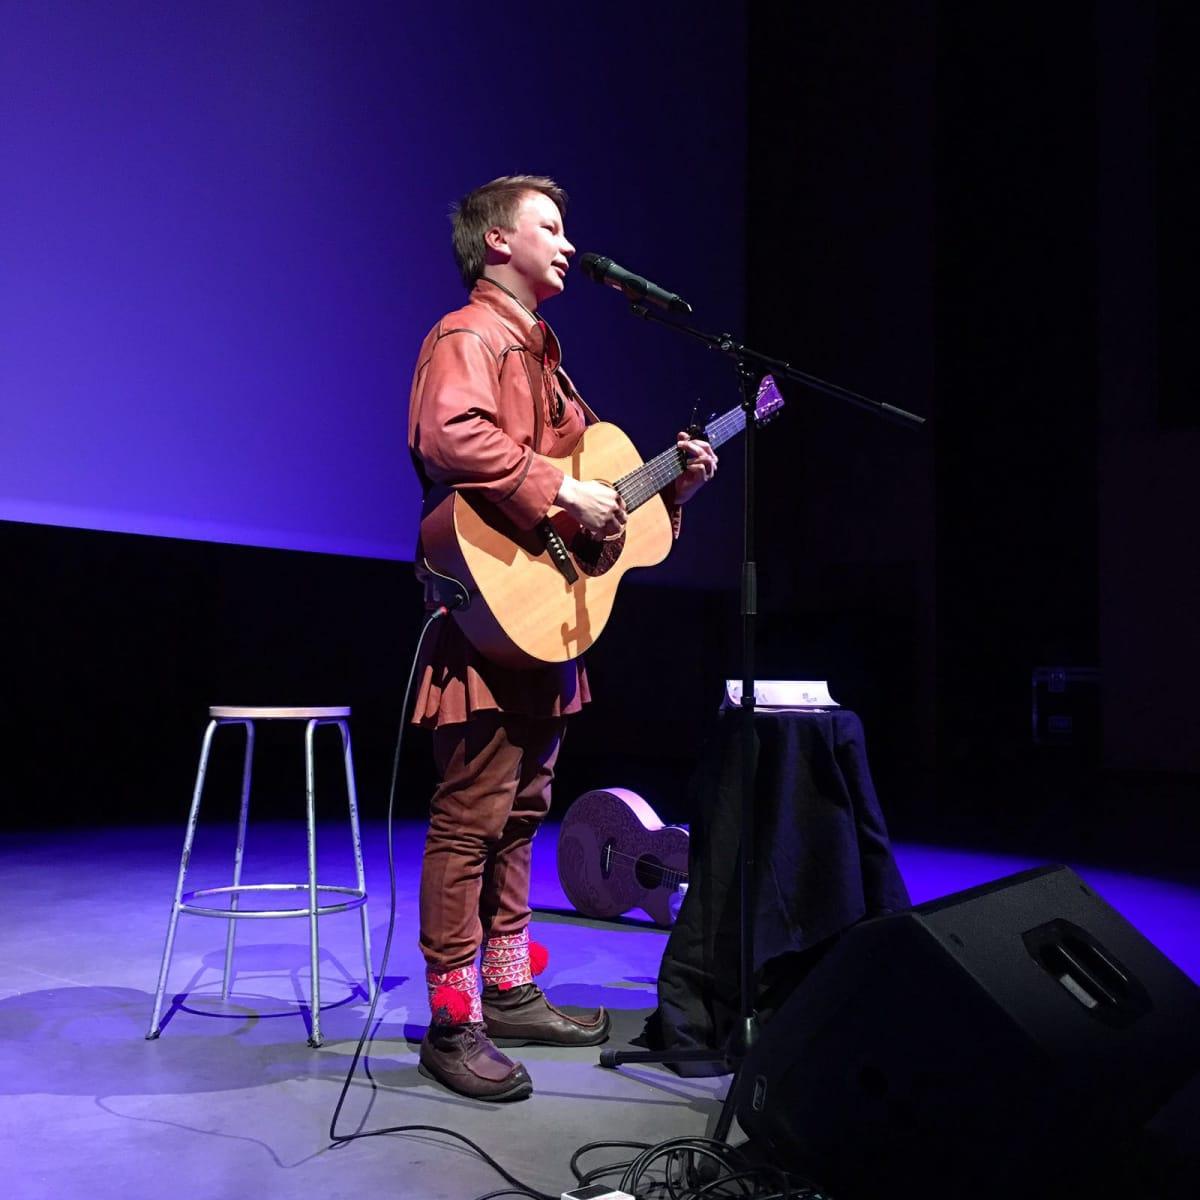 Mikrofovdna játtai gaskan Niillas Holmberg lávluma. Holmberg dadjalii: Mikrofovdnii geavai vehá dego sámi vuoigatvuođaide.